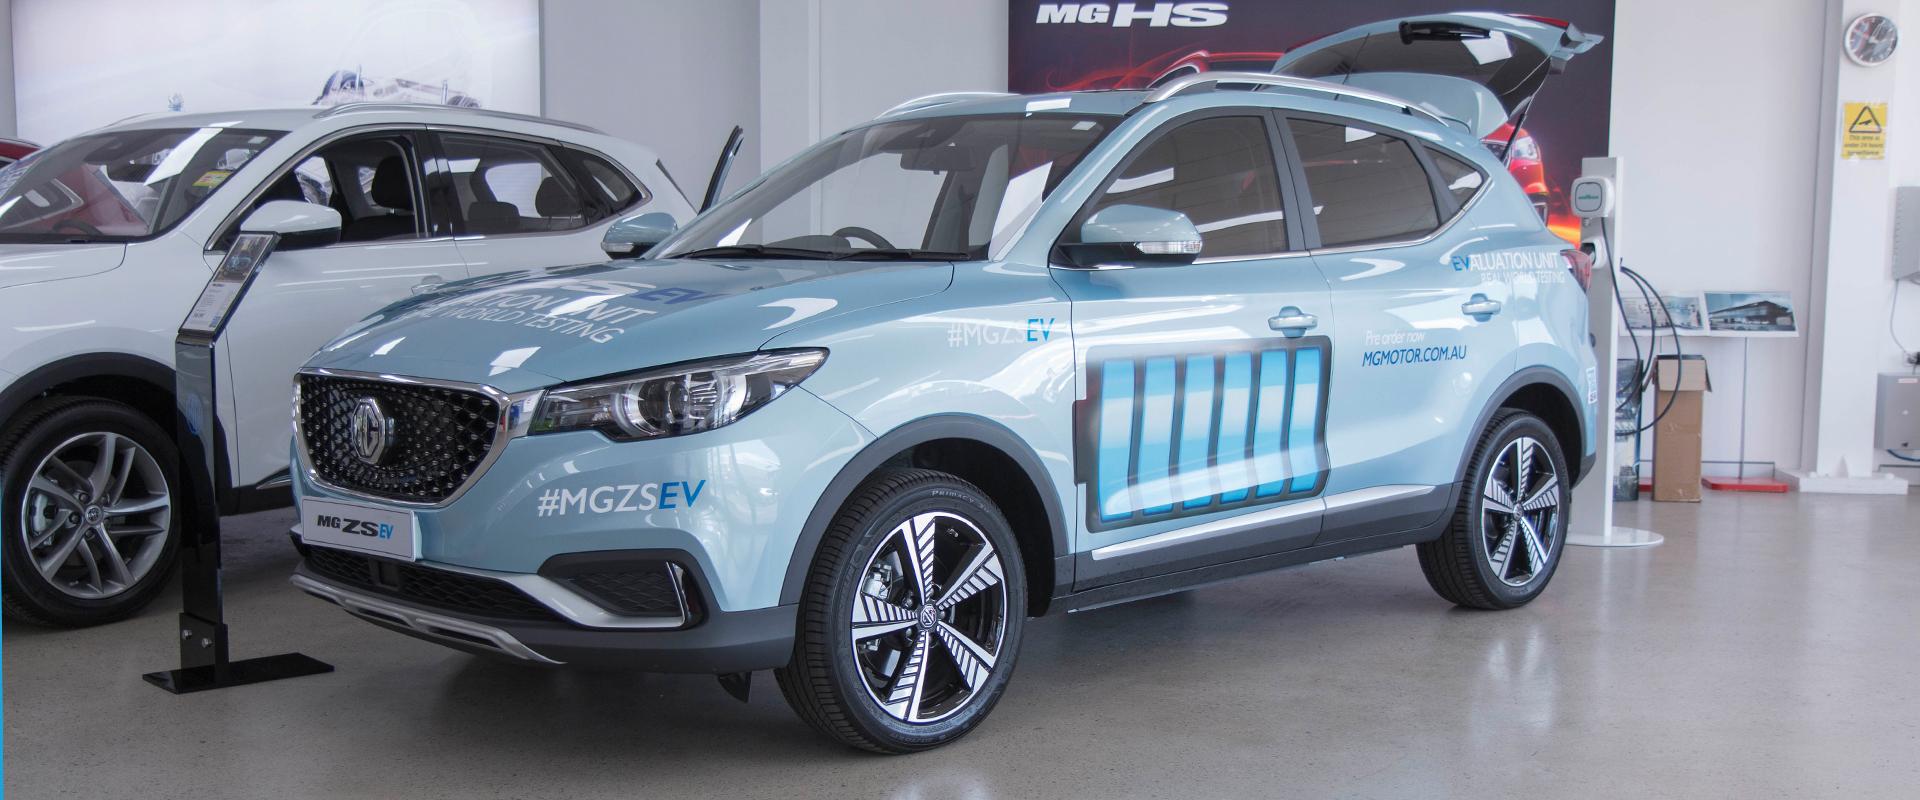 MG ZS EV Display Event at MG Parramatta